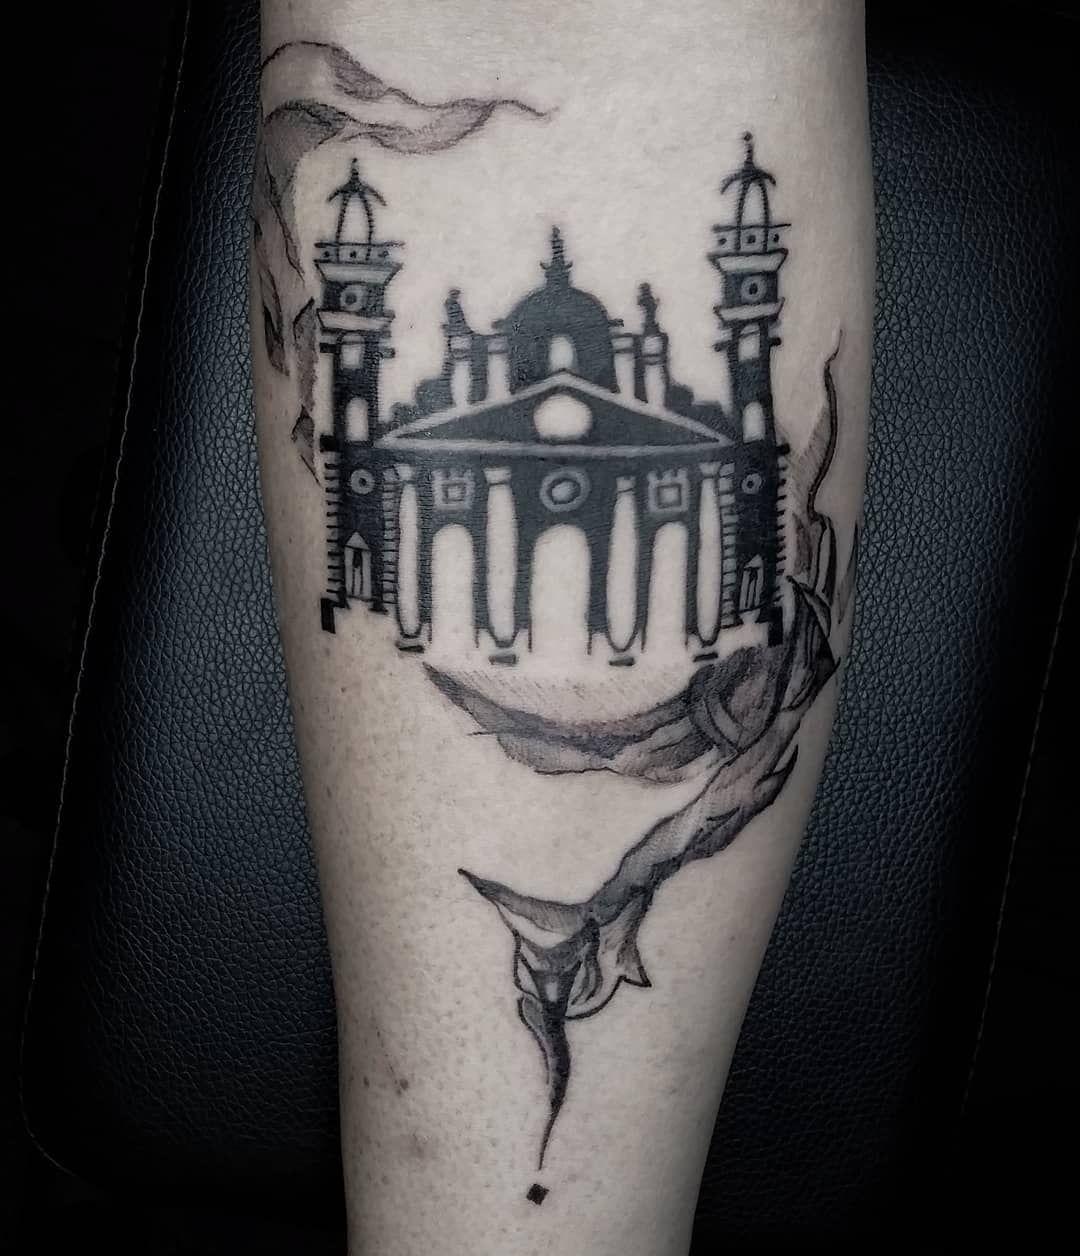 Home is a planet. tour life. . . . . . .  #architecture #basilica #stayhome #tattoo #tattooart #blackandgrey #black #octo #drawingart #santiago #chile #maracaibo #tinta #art